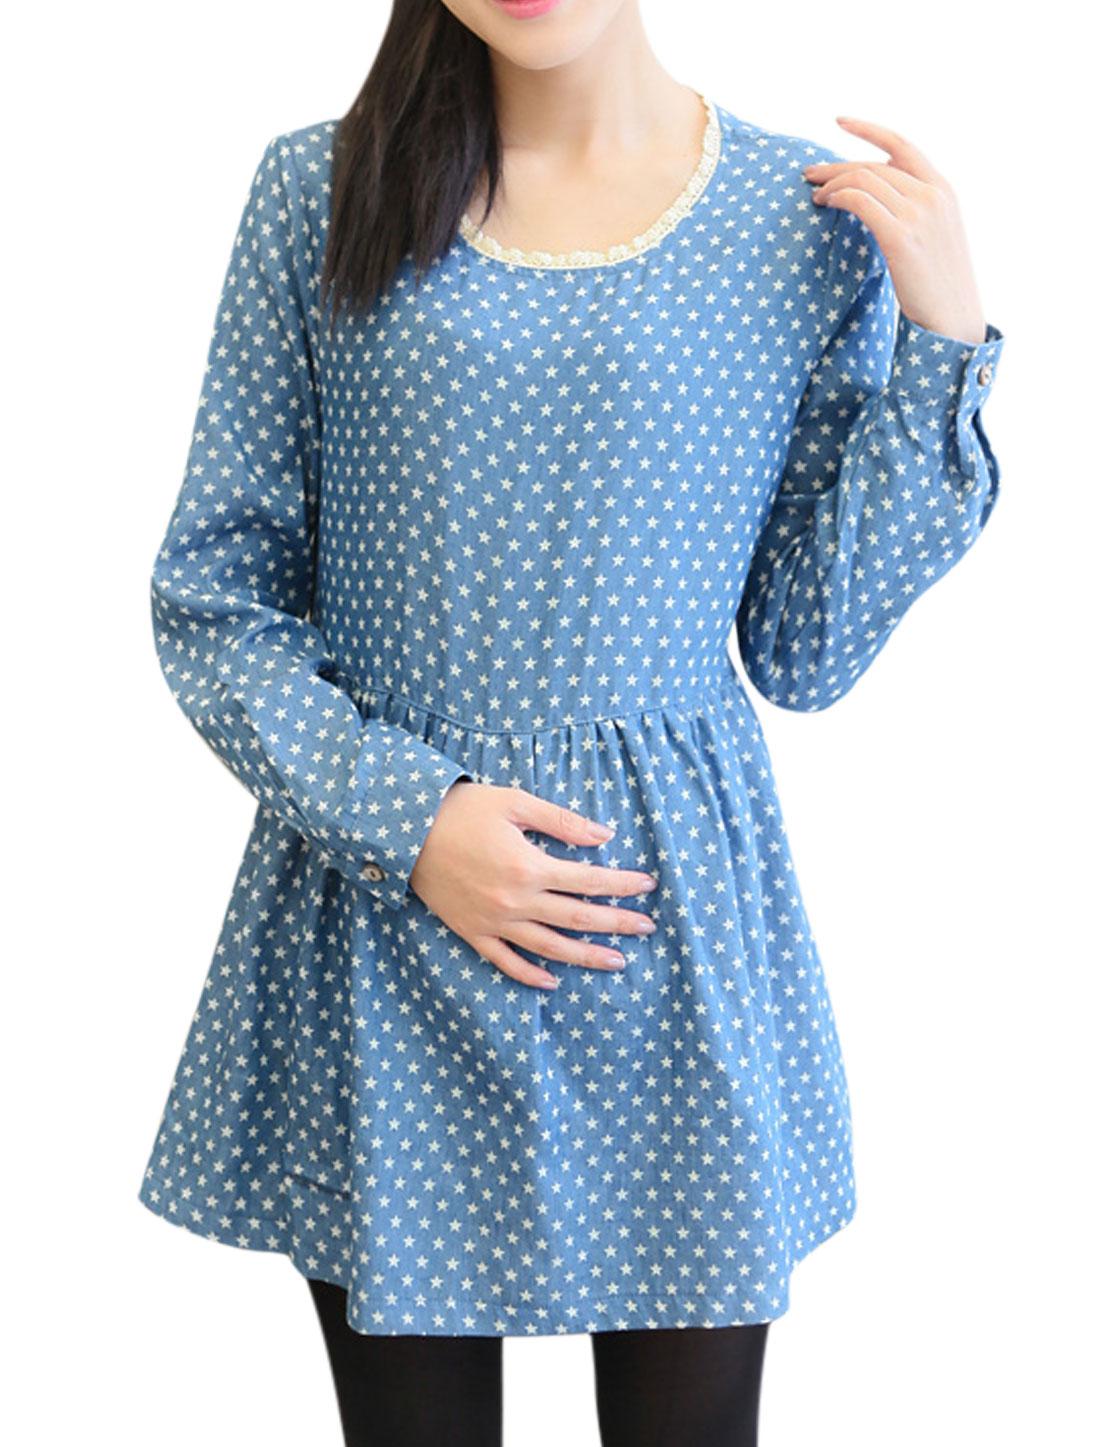 Motherhood Self Tie String Stars Pattern Crochet Trim Soft Top Light Blue M